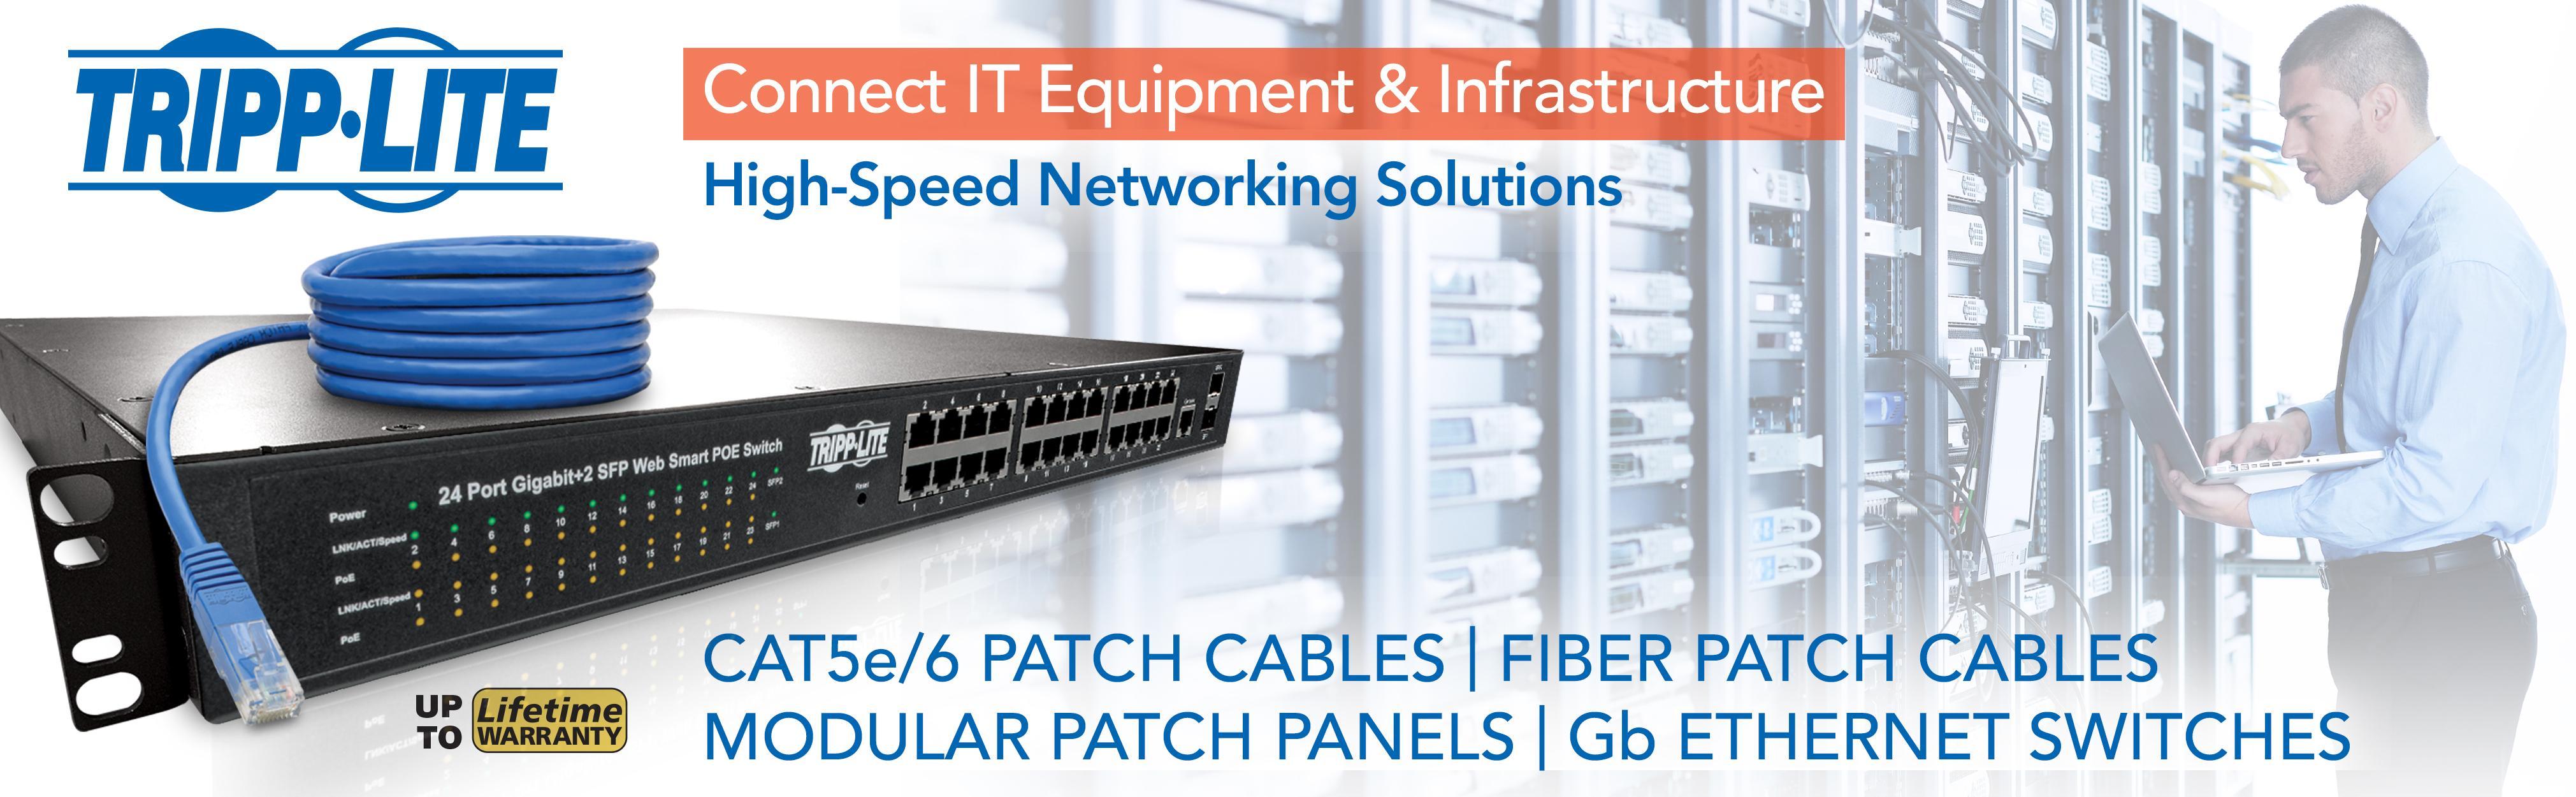 Cat5 Wiring Diagram On Peak Electronic Design Limited Ethernet Wiring